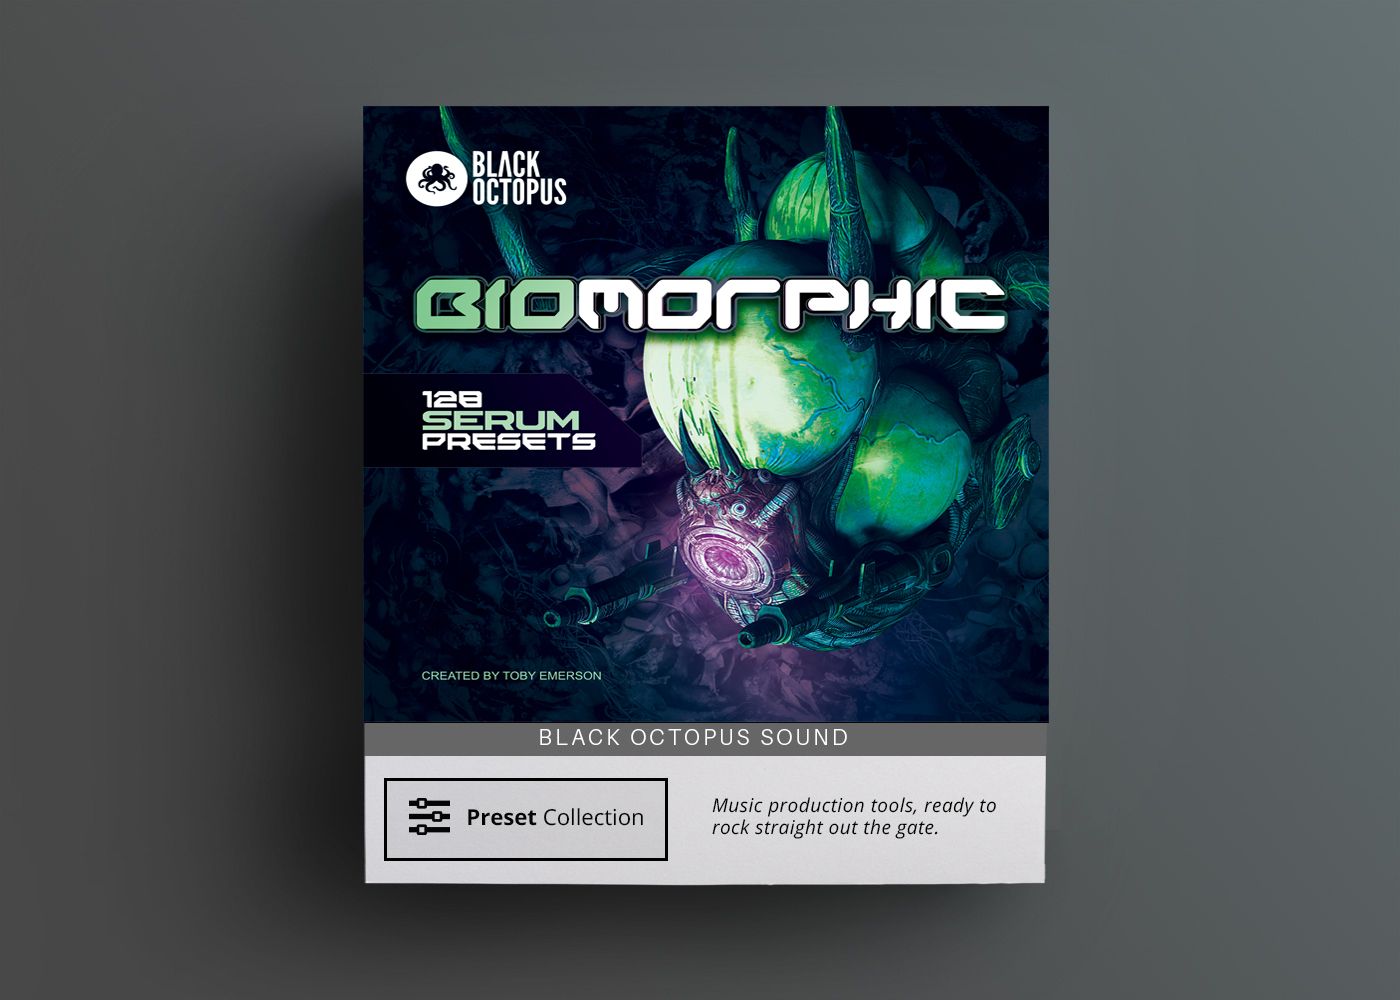 biomorhpic